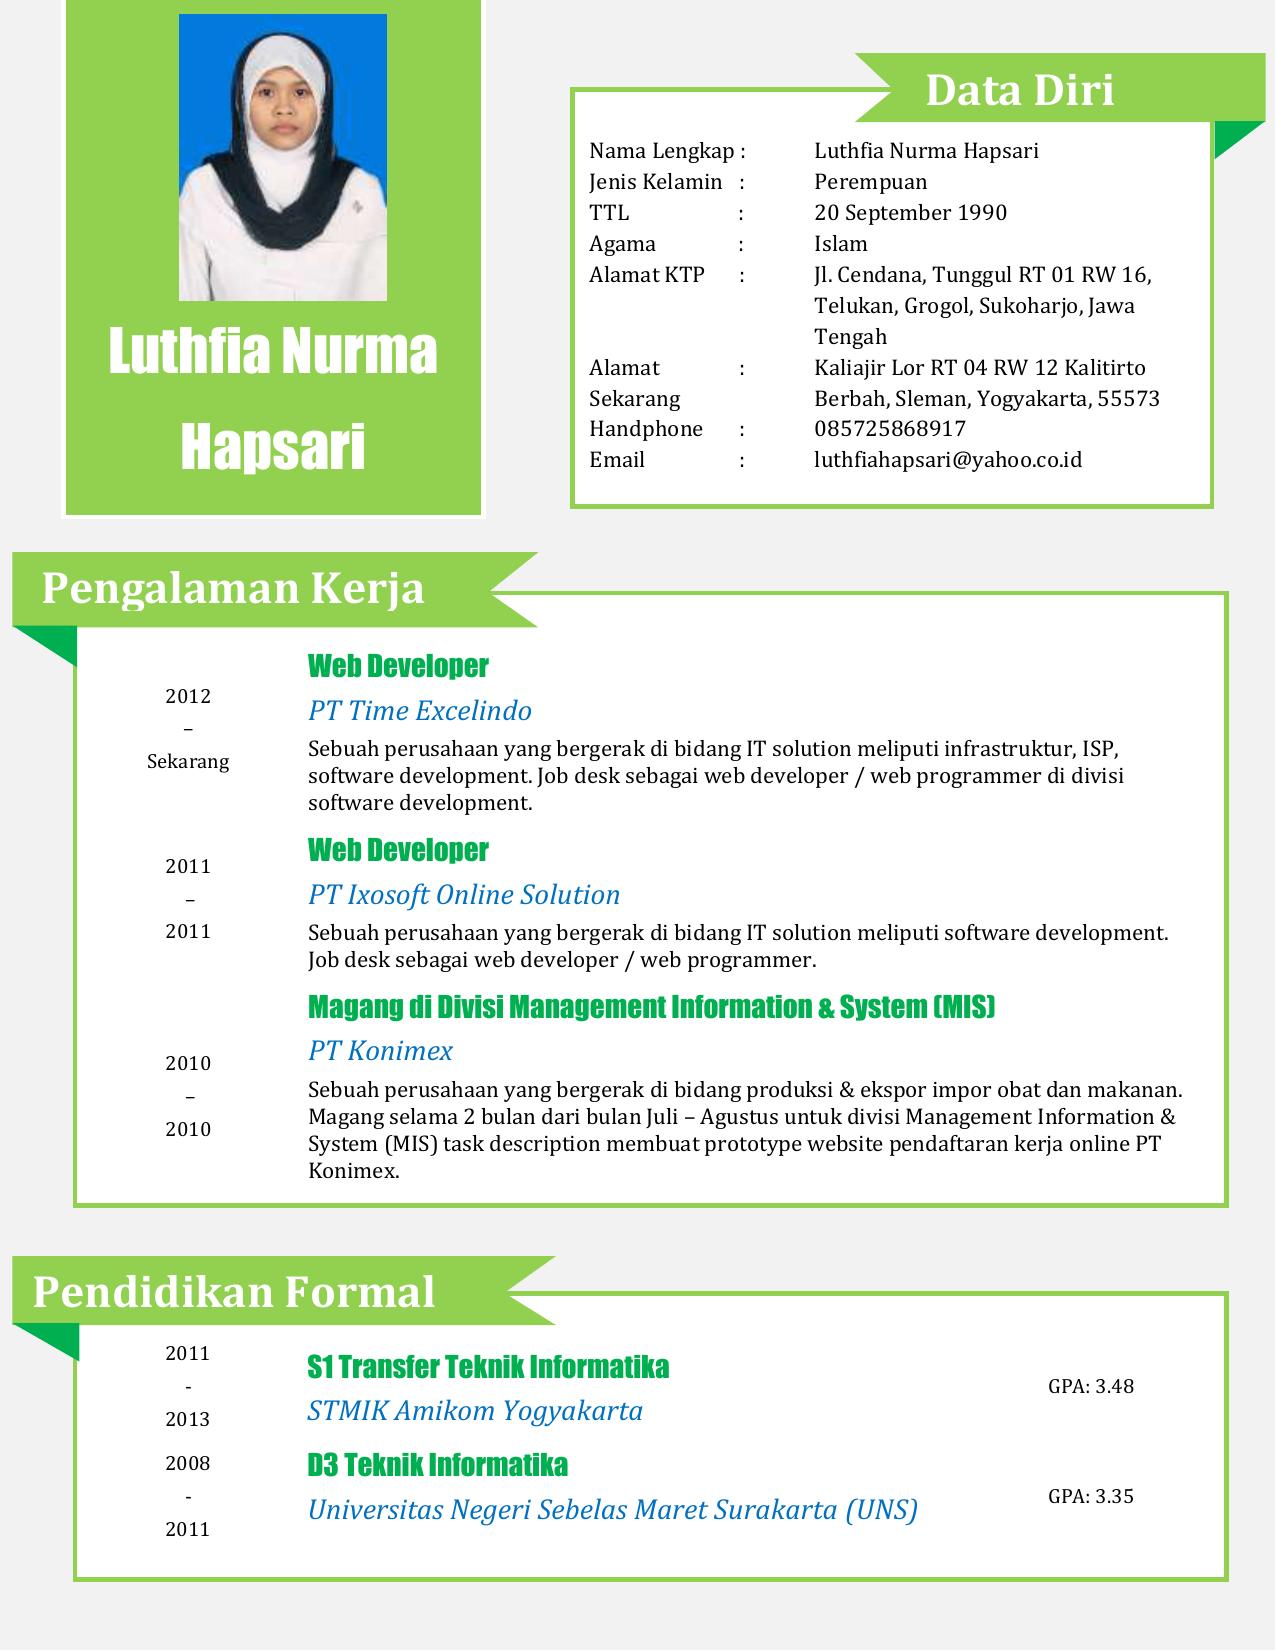 SKI FMIPA Universitas Negeri Sebelas Maret Surakarta (UNS)